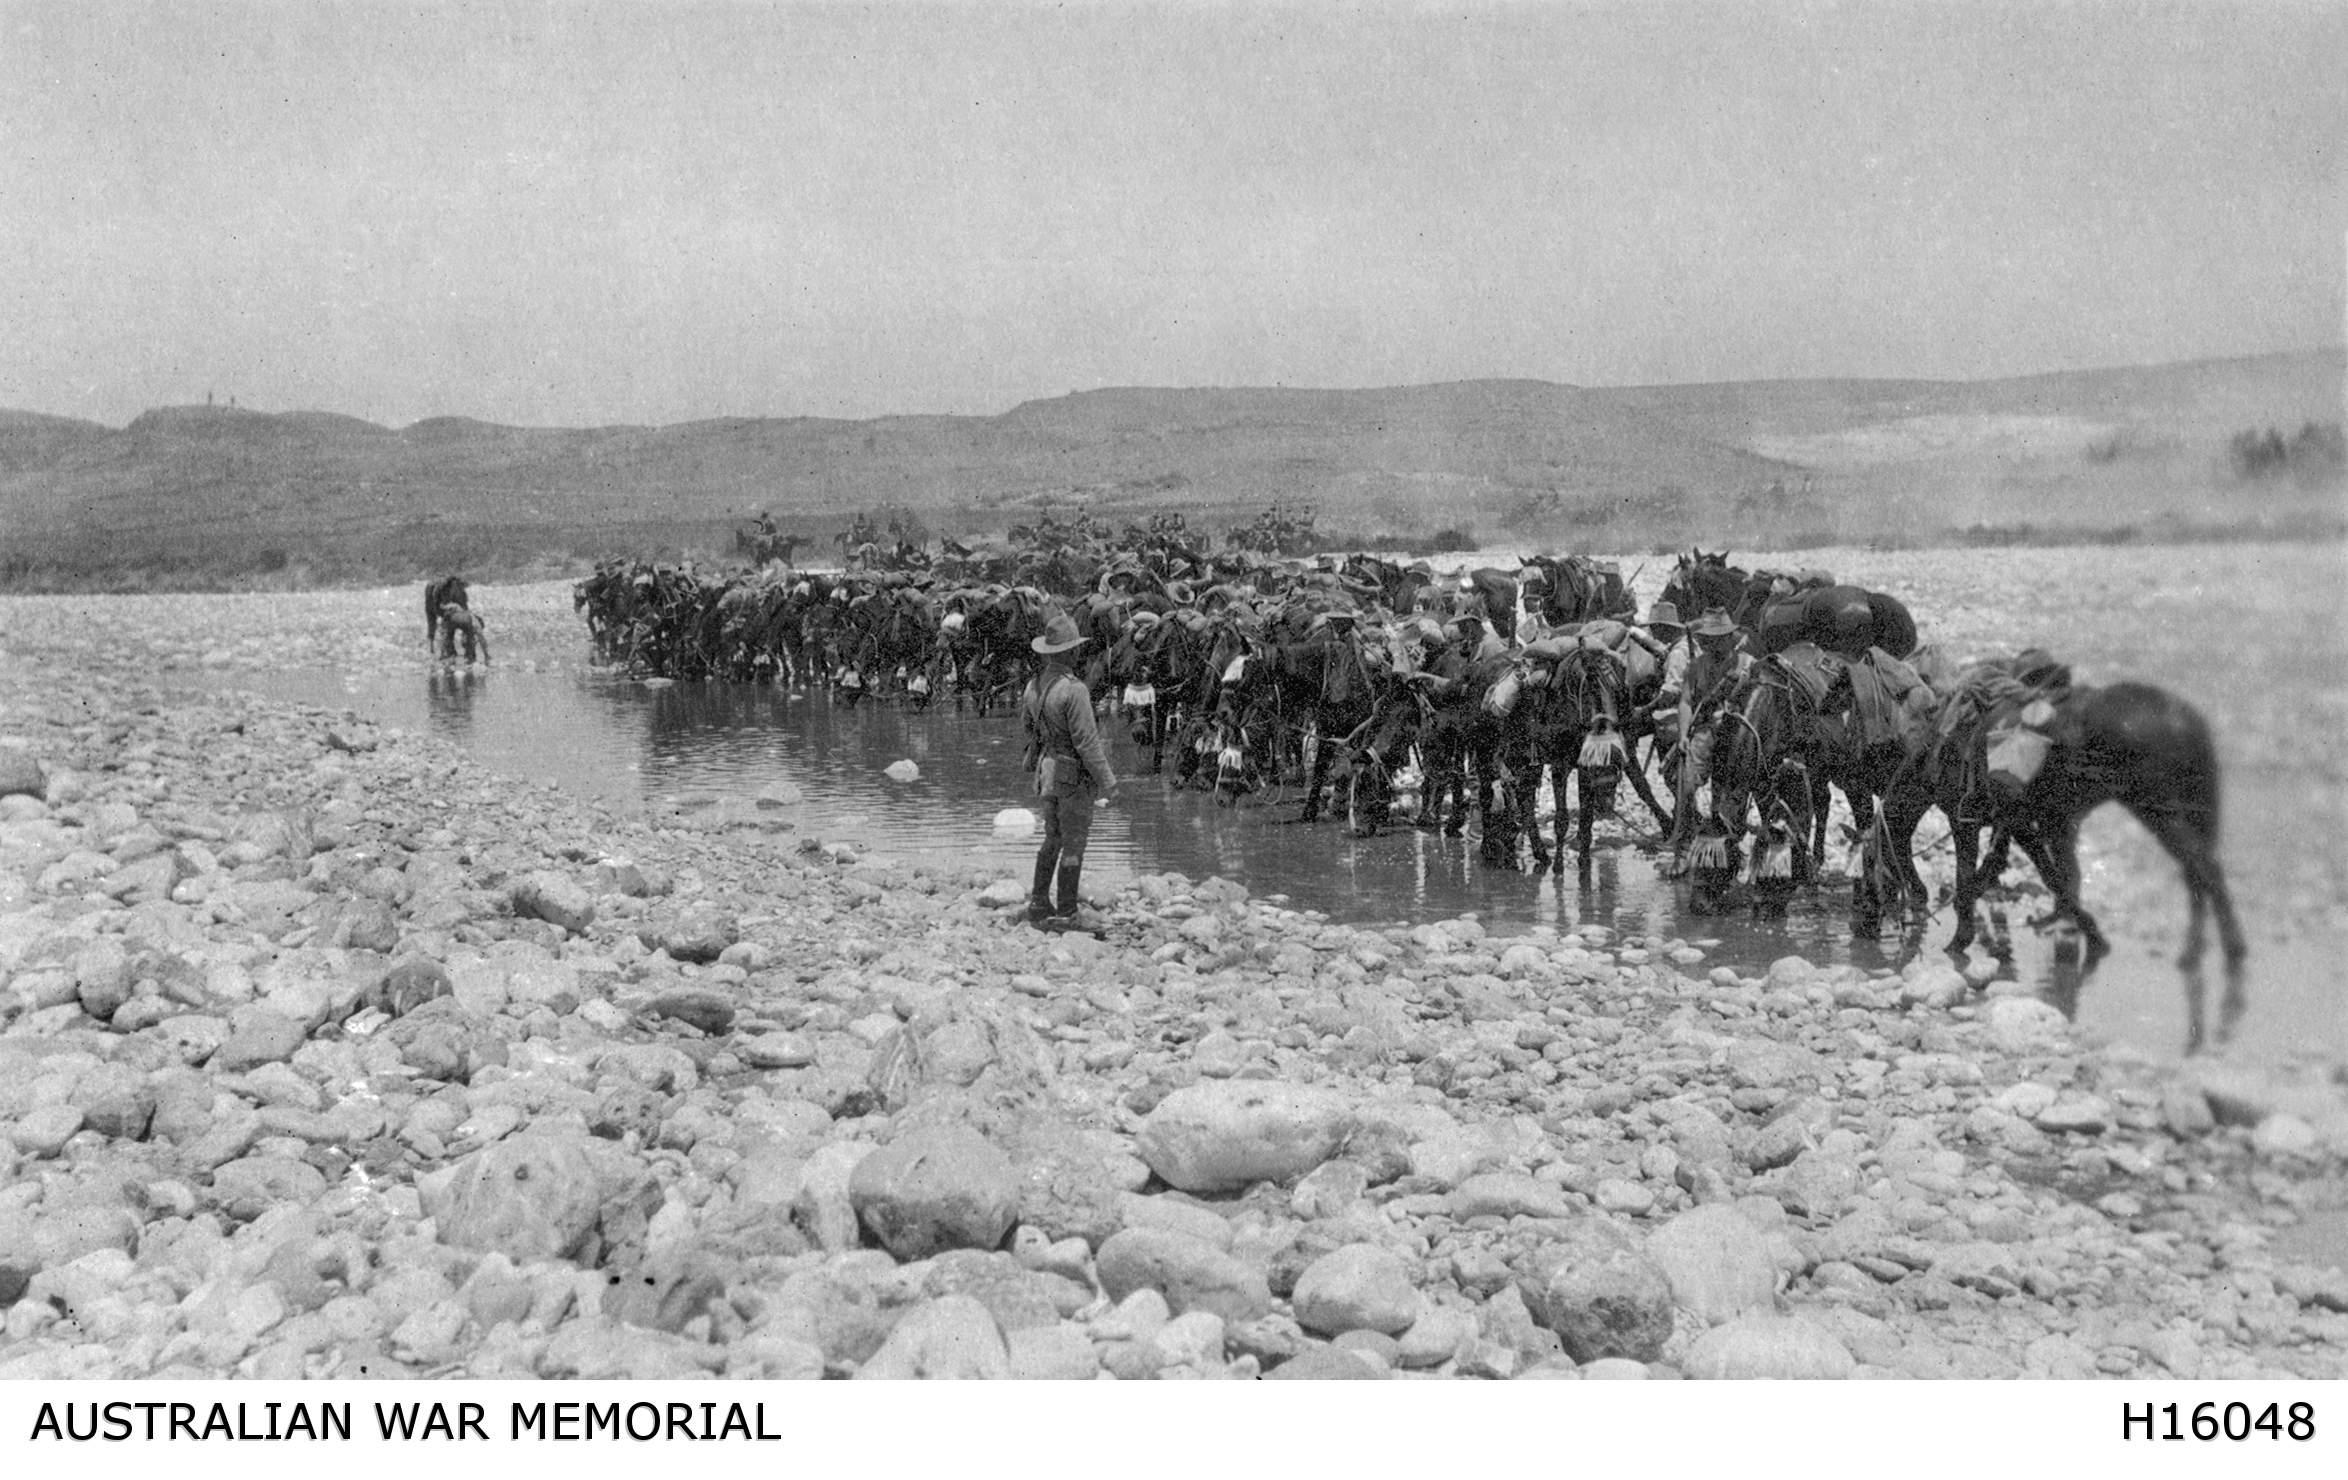 Light Horsemen watering their horses in Esani, circa 1916